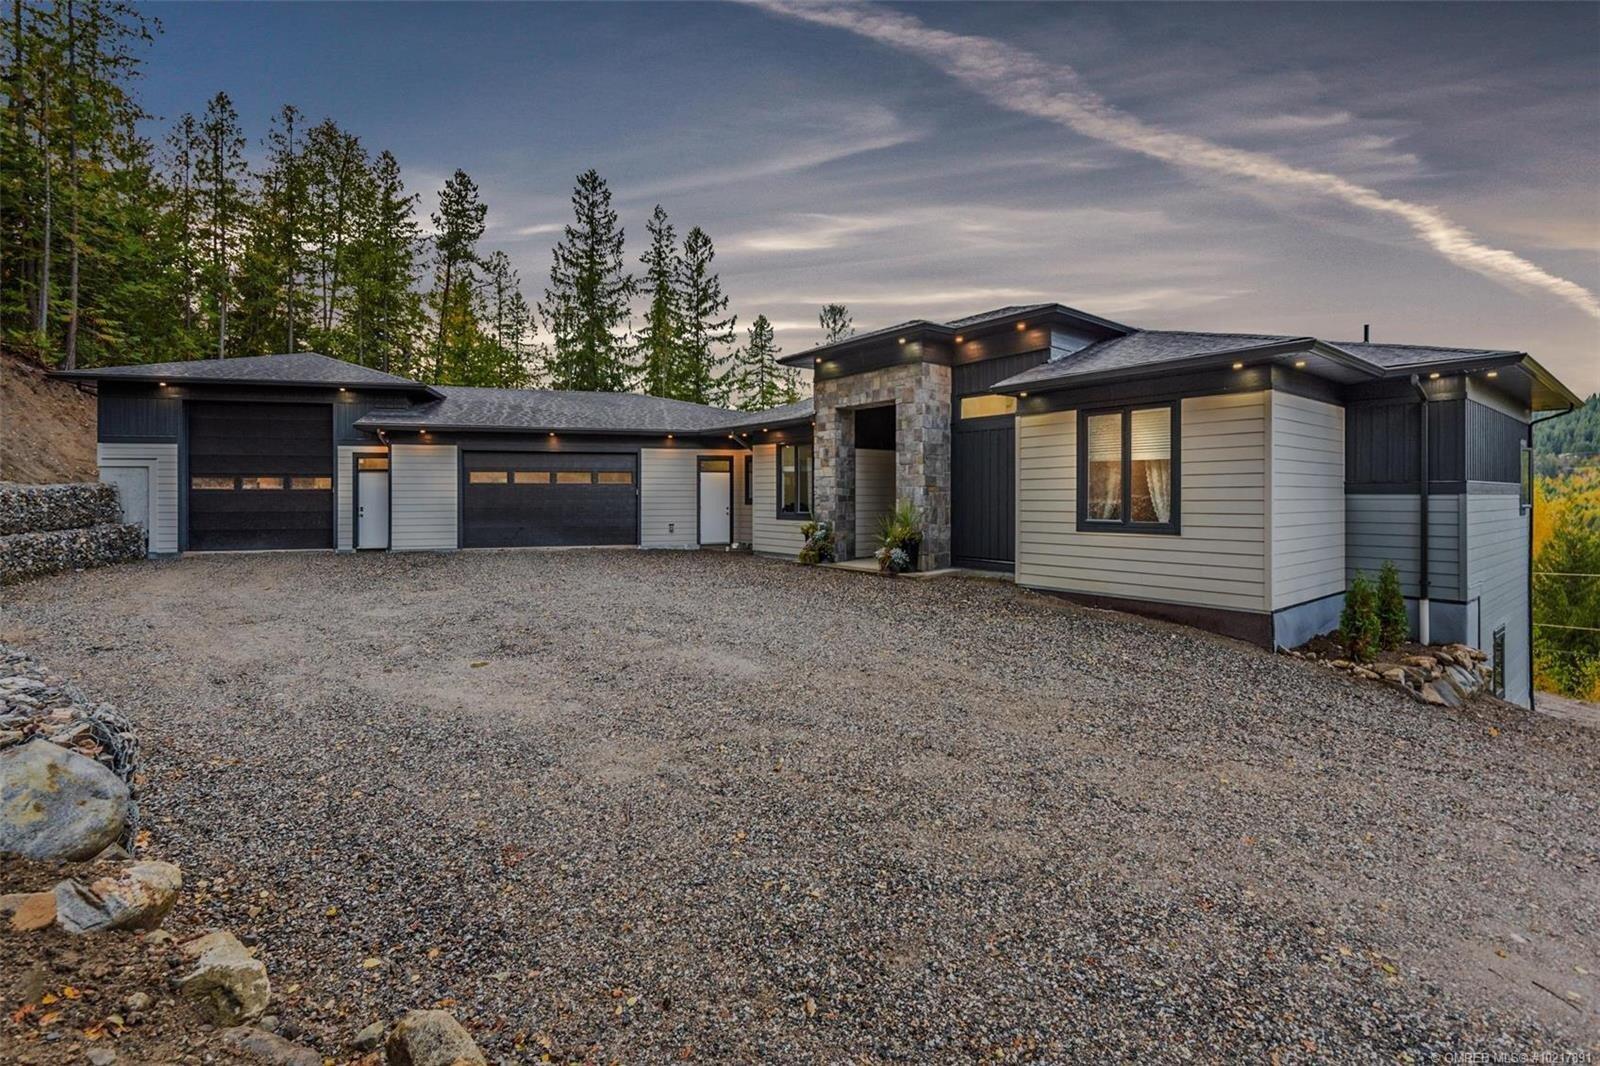 House for sale at 7425 Dixon Dam Rd Vernon British Columbia - MLS: 10217891